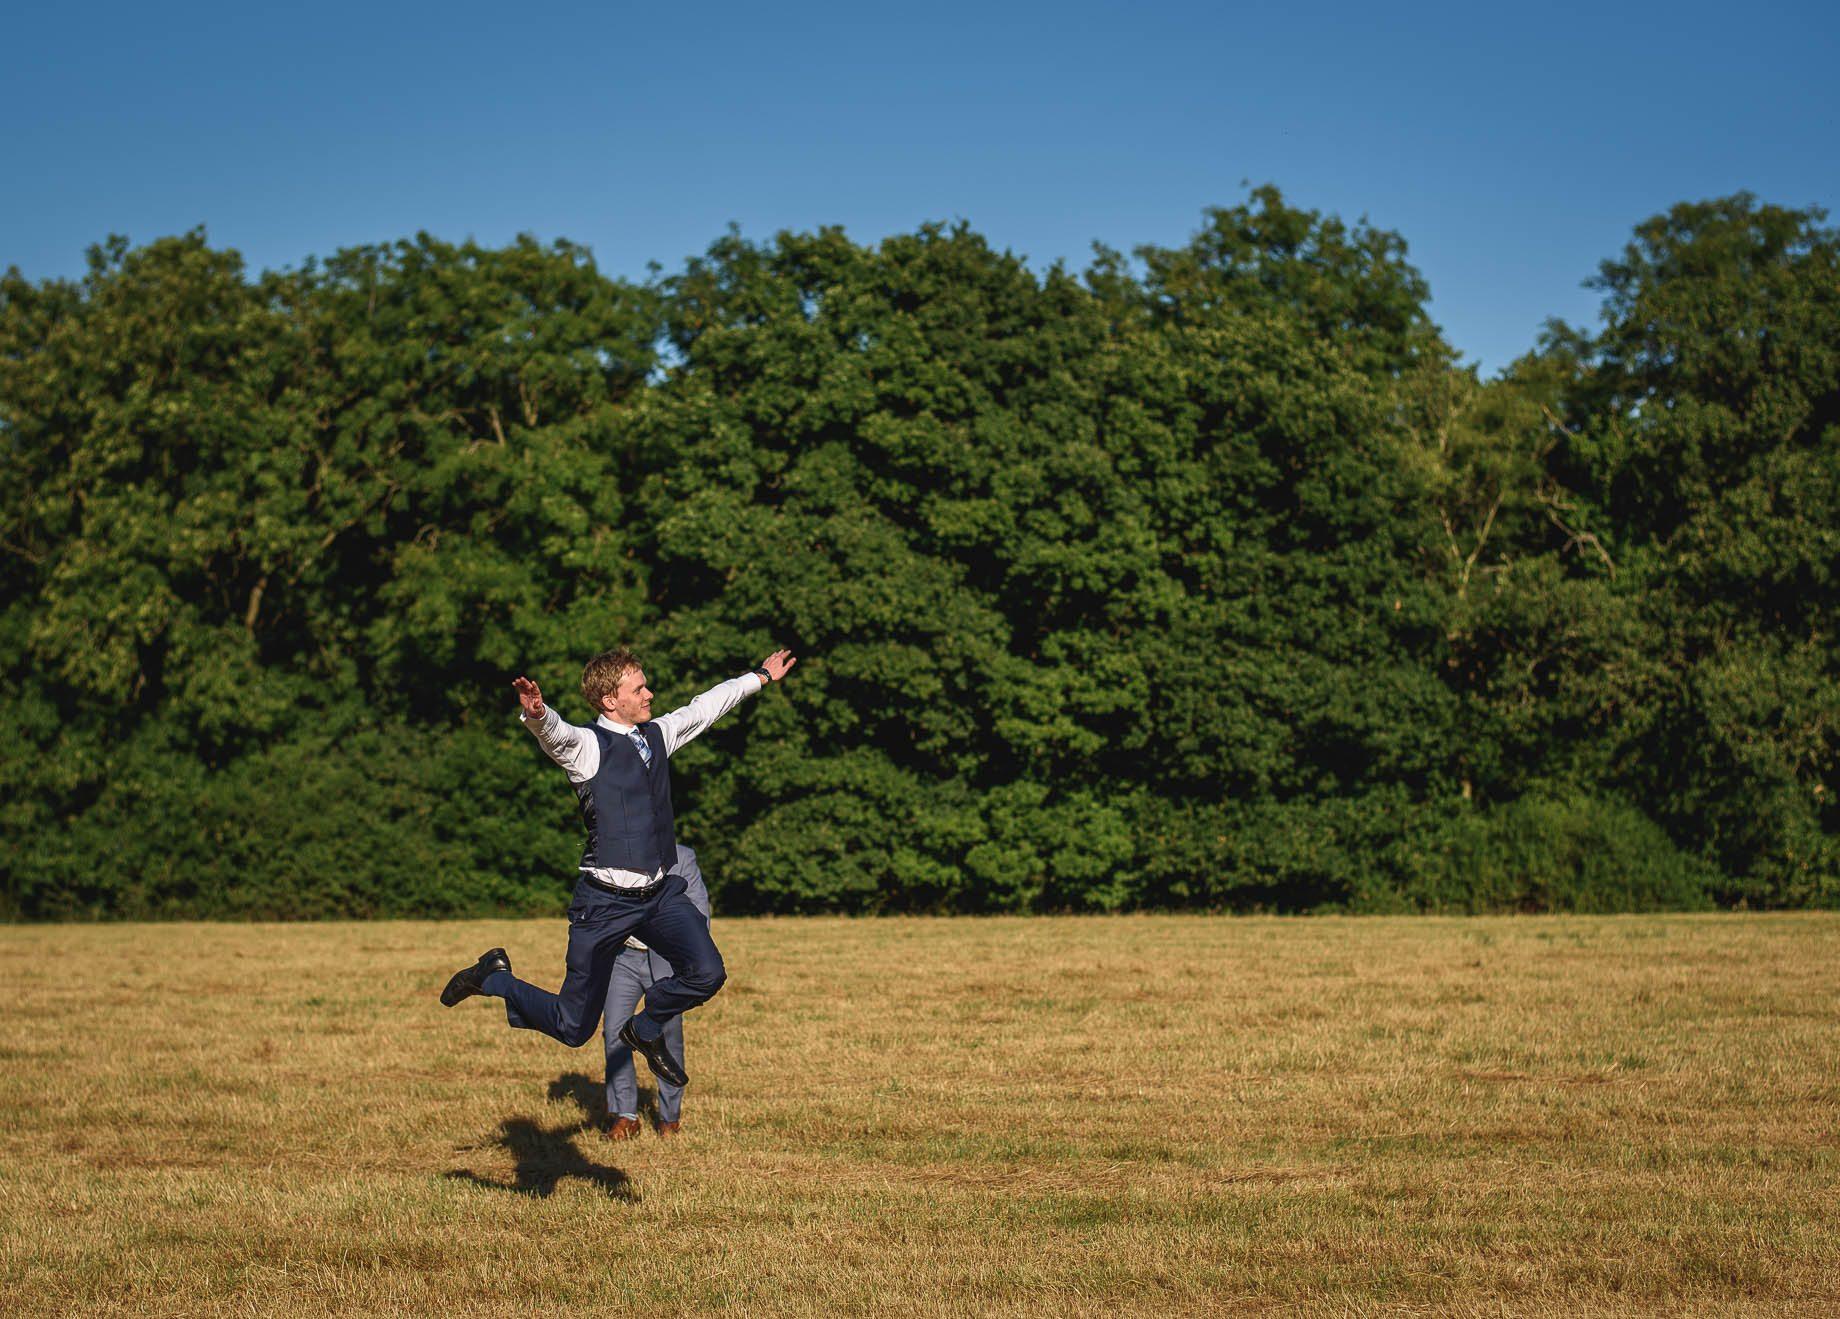 Gildings Barn wedding photography - Sarah and Steve (154 of 190)